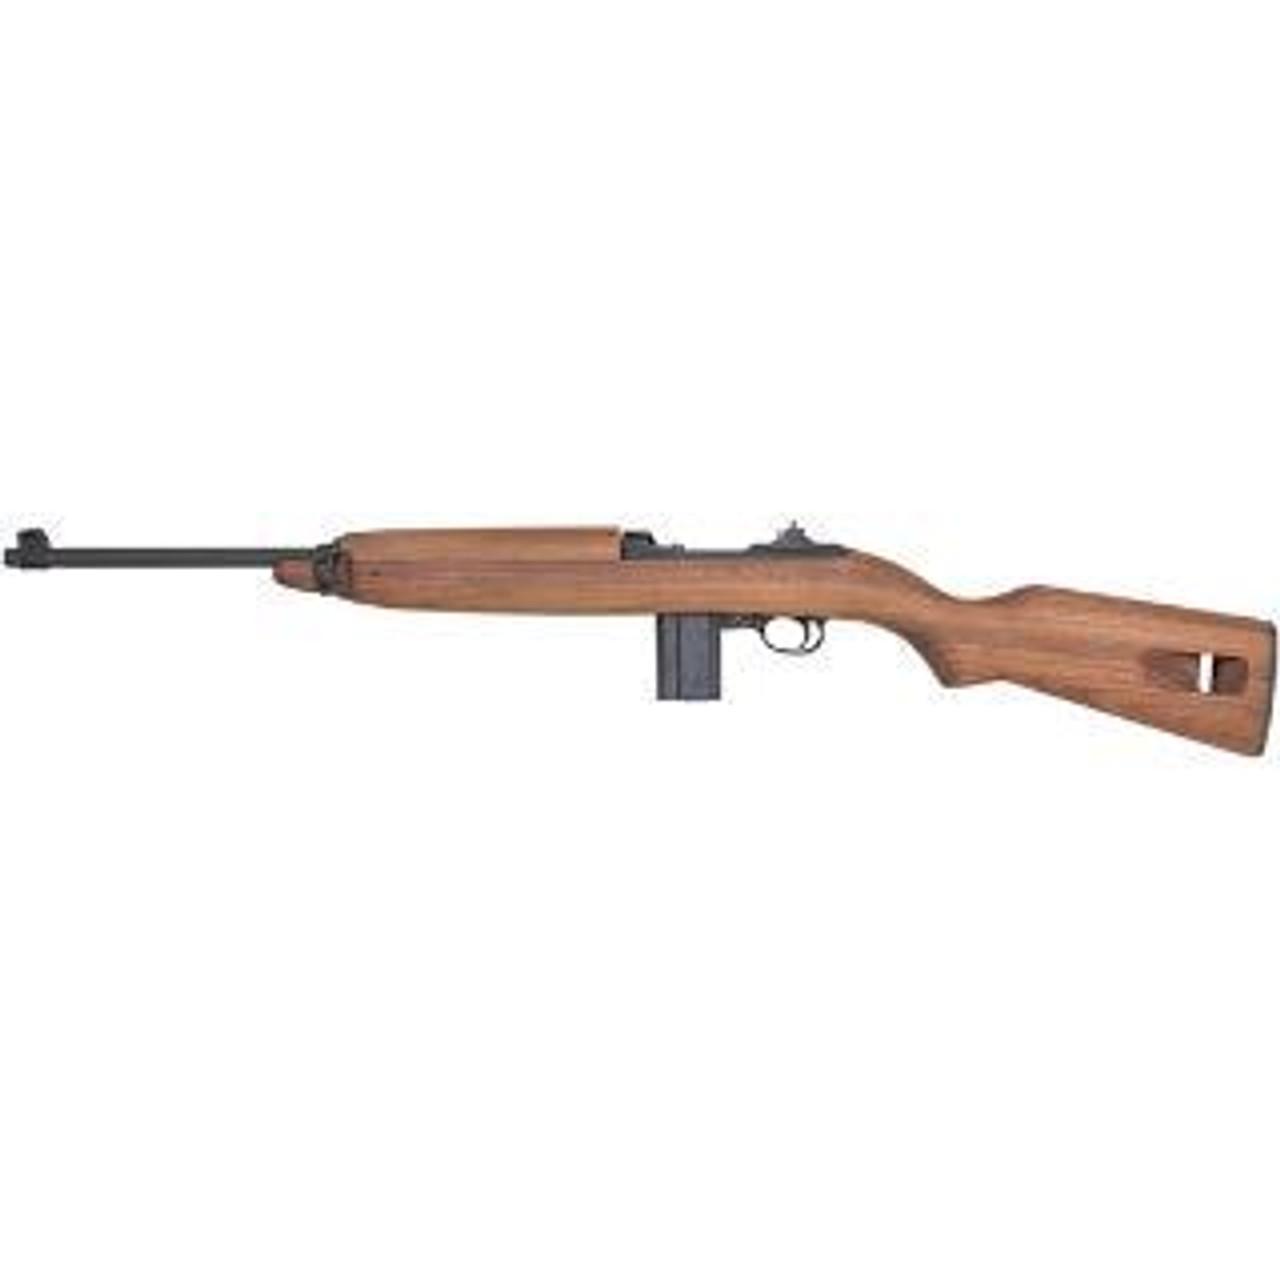 Auto Ordnance M1 Carbine CALIFORNIA LEGAL - .30Carbine